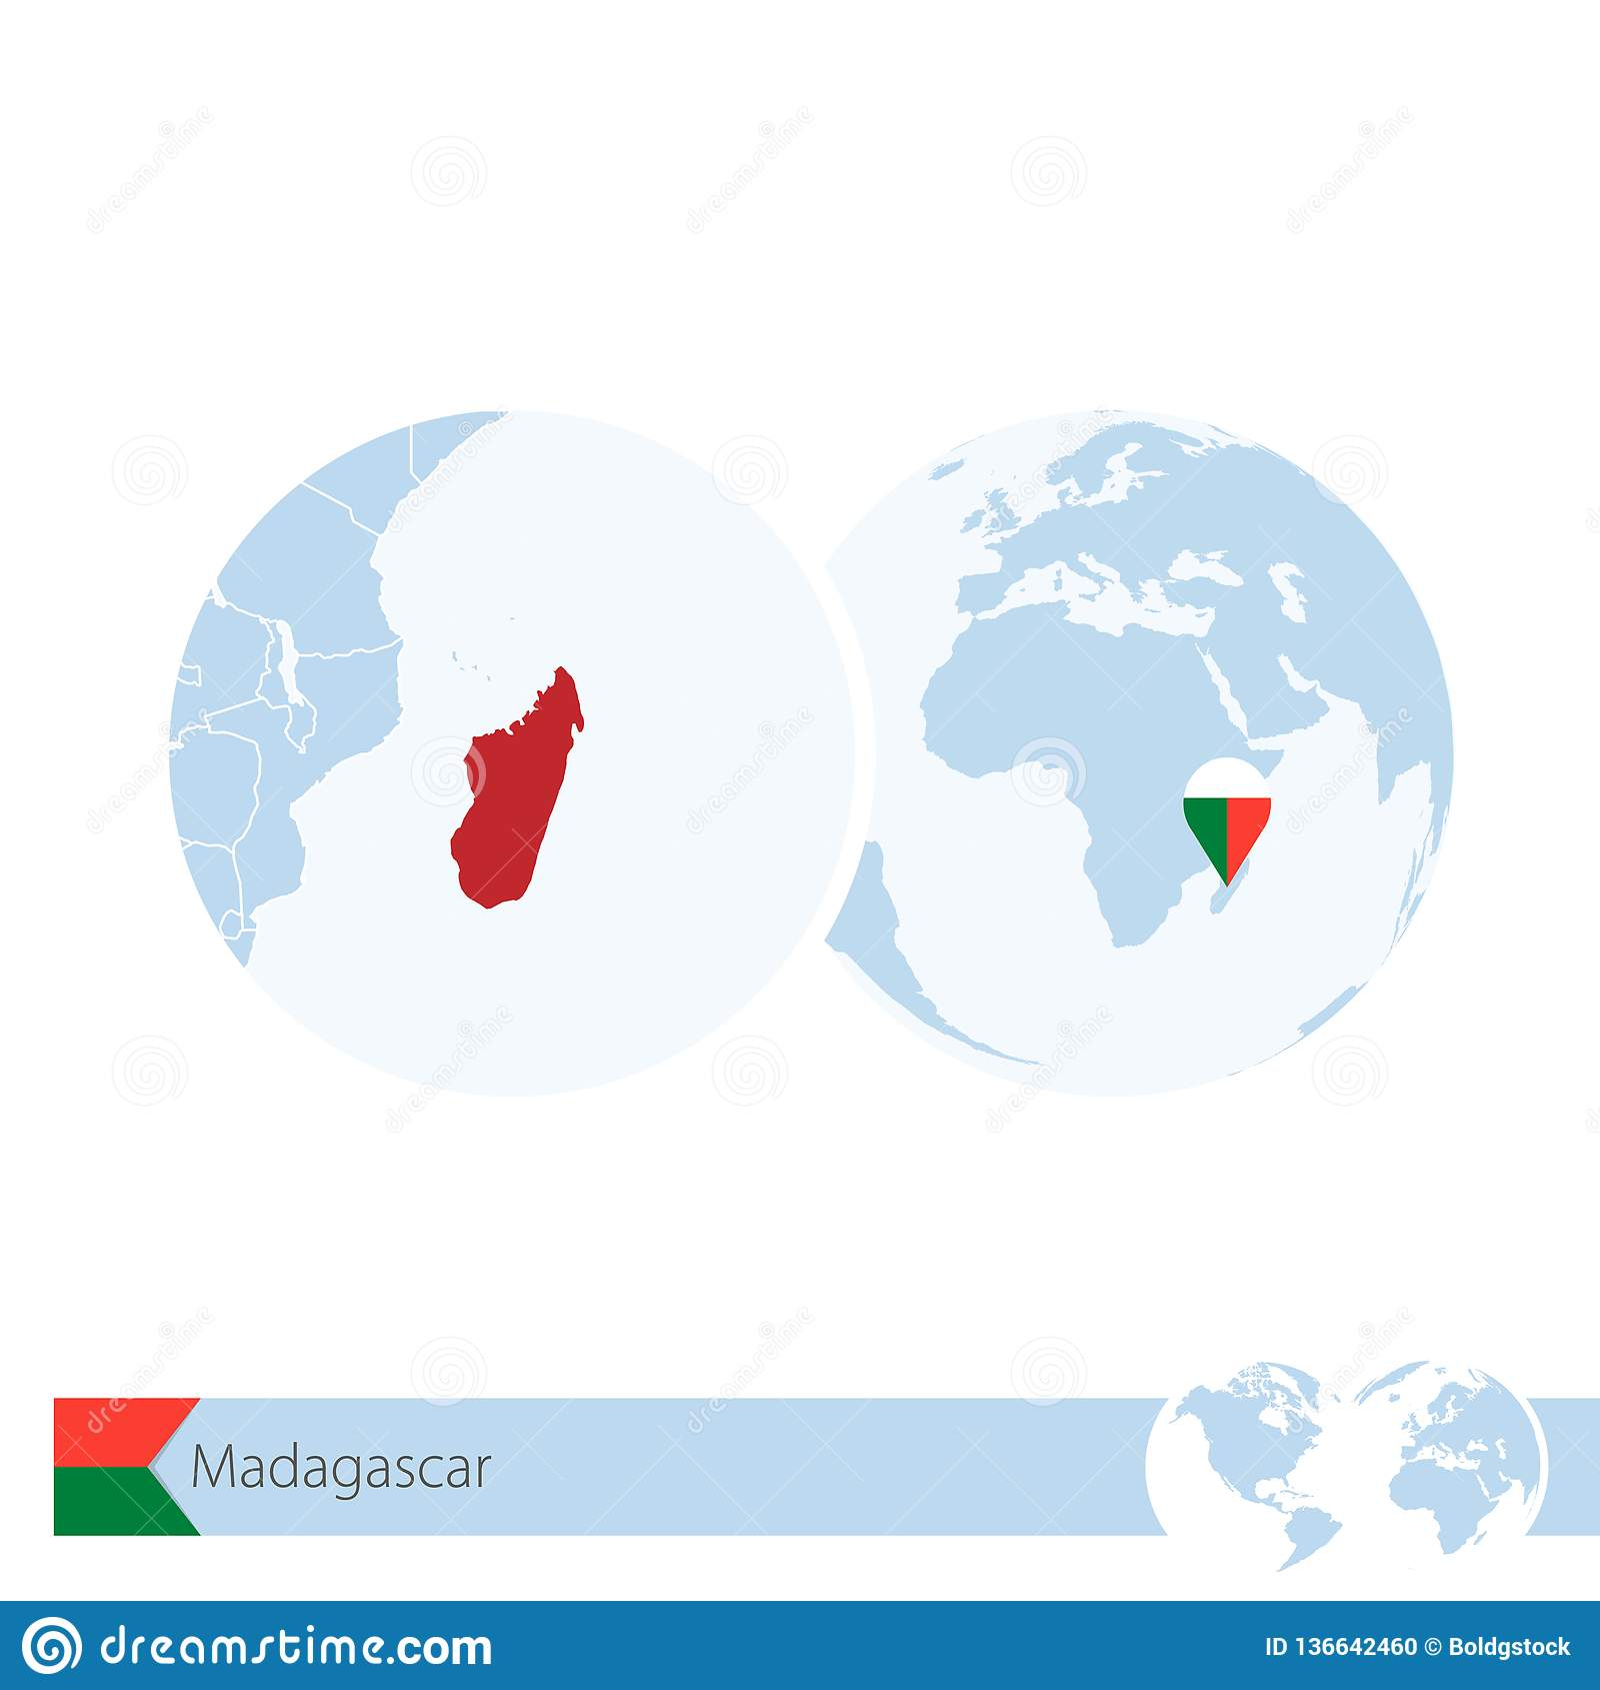 Madagascar On World Globe With Flag And Regional Map Of Madagascar ...